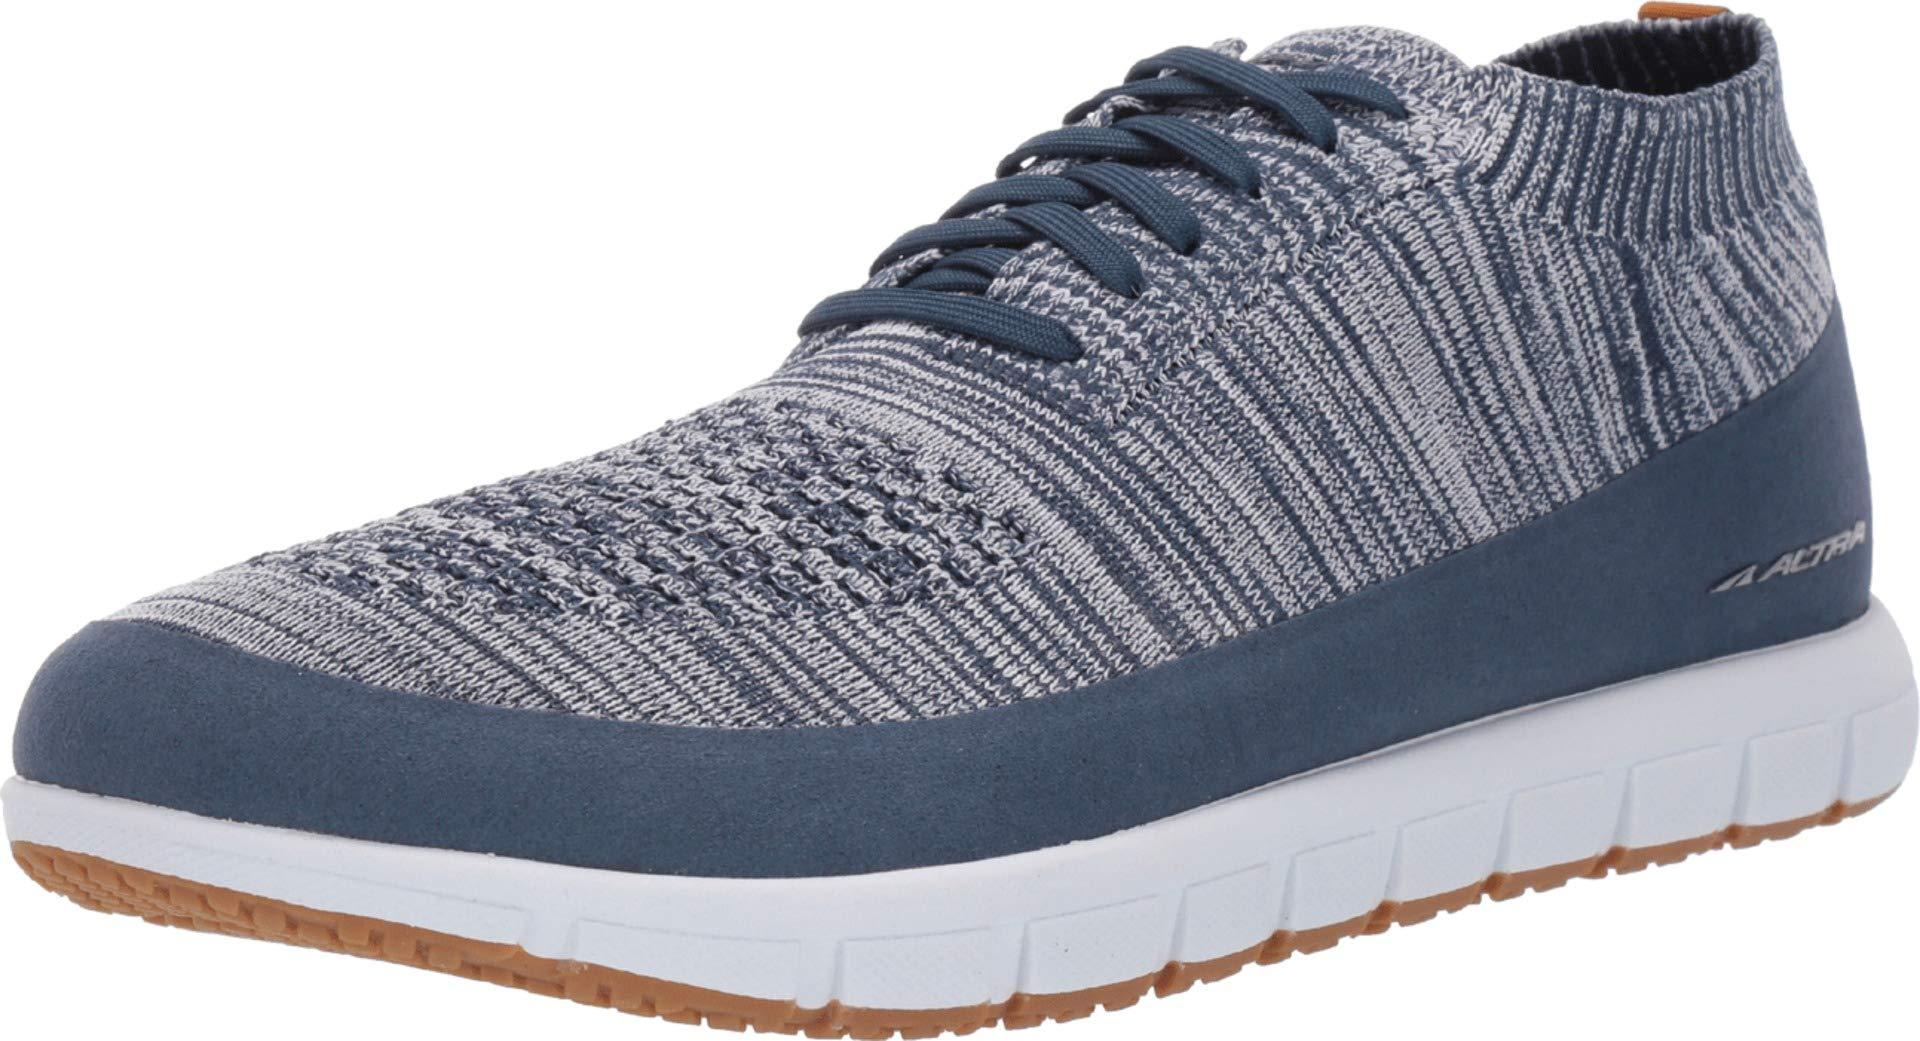 Altra Footwear Men's Vali Blue 13 D US